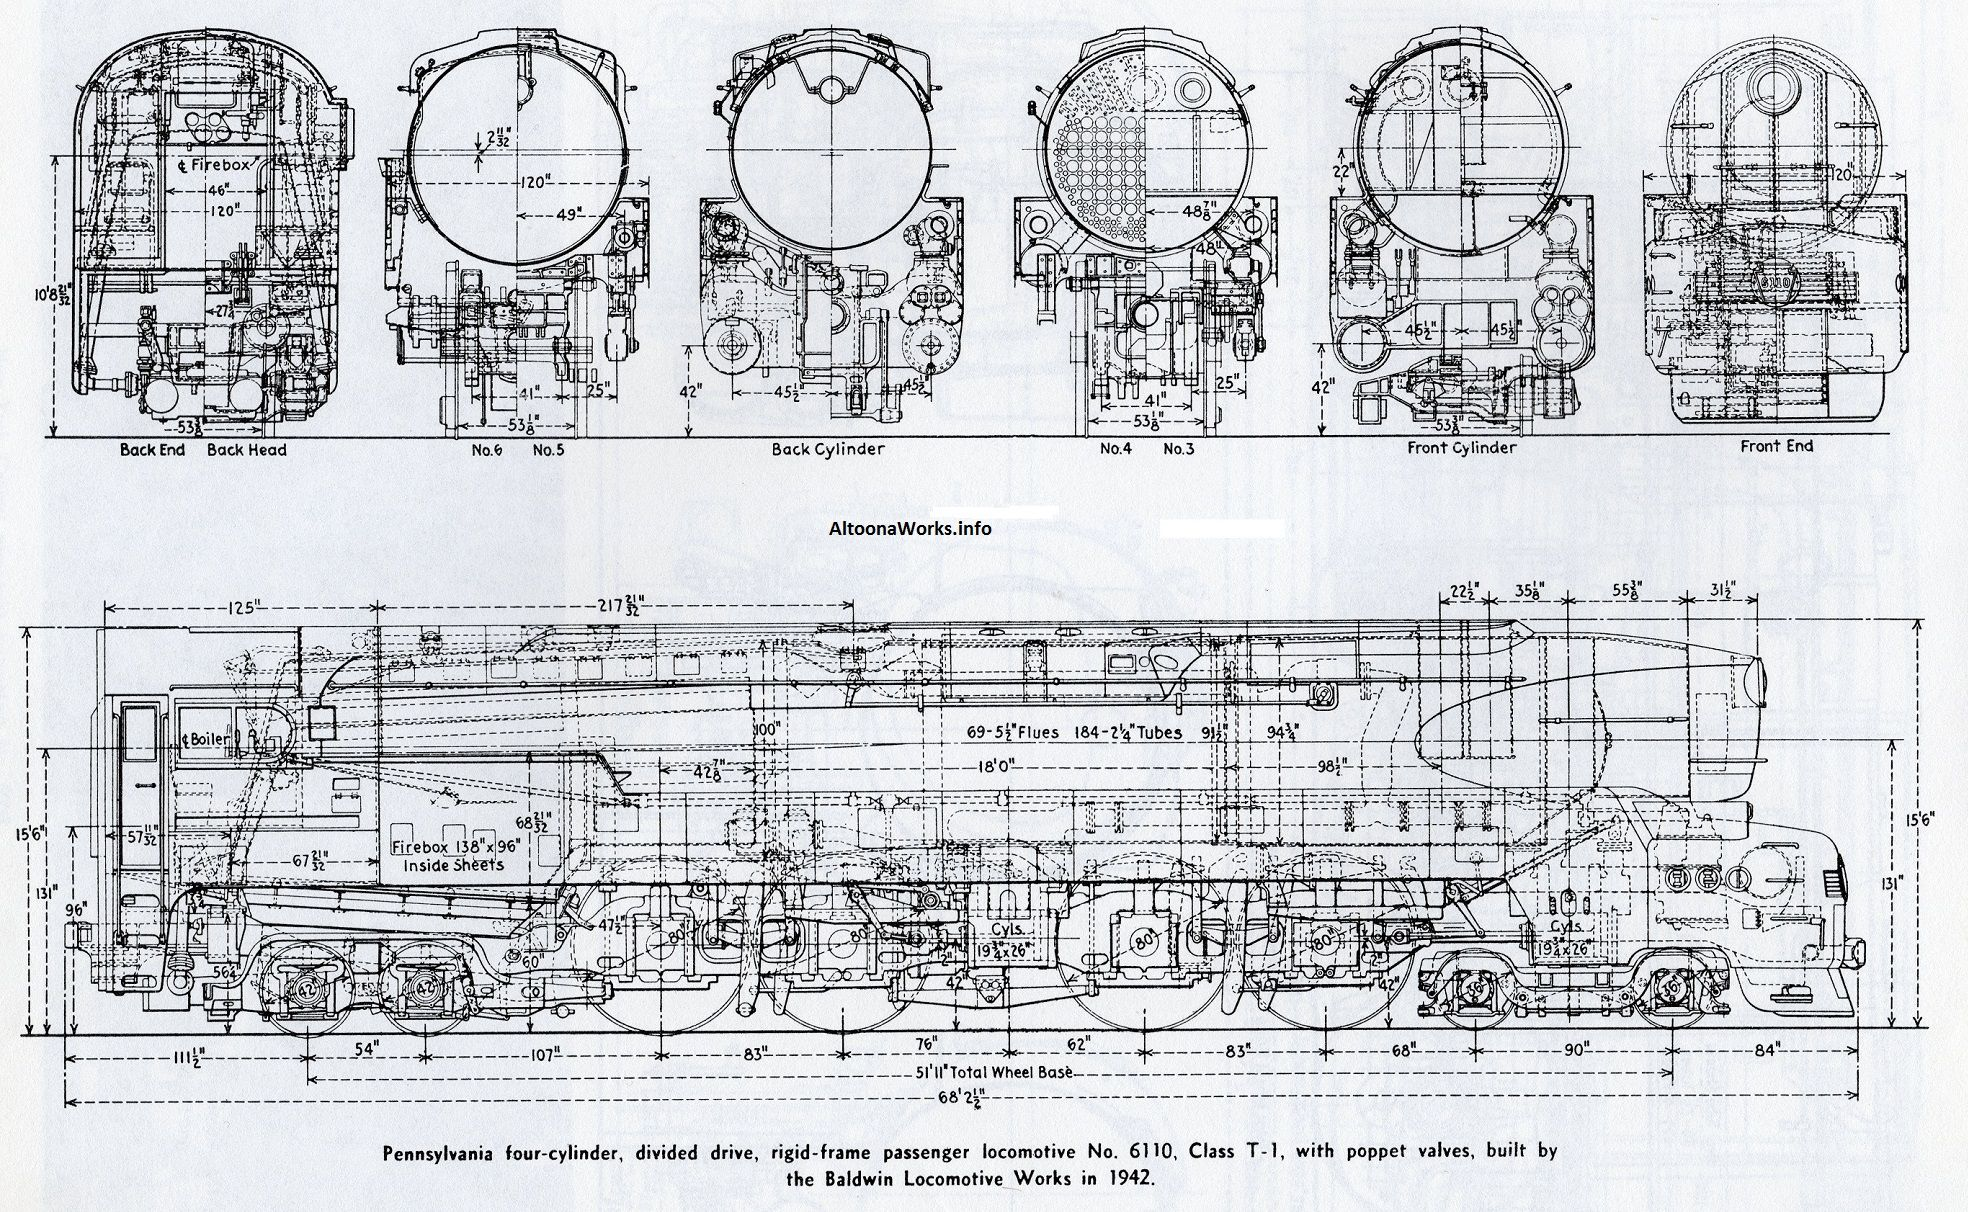 small resolution of pennsylvania t 1 4 4 4 4 baldwin 1942 locomotive cutaways prr barge diagram